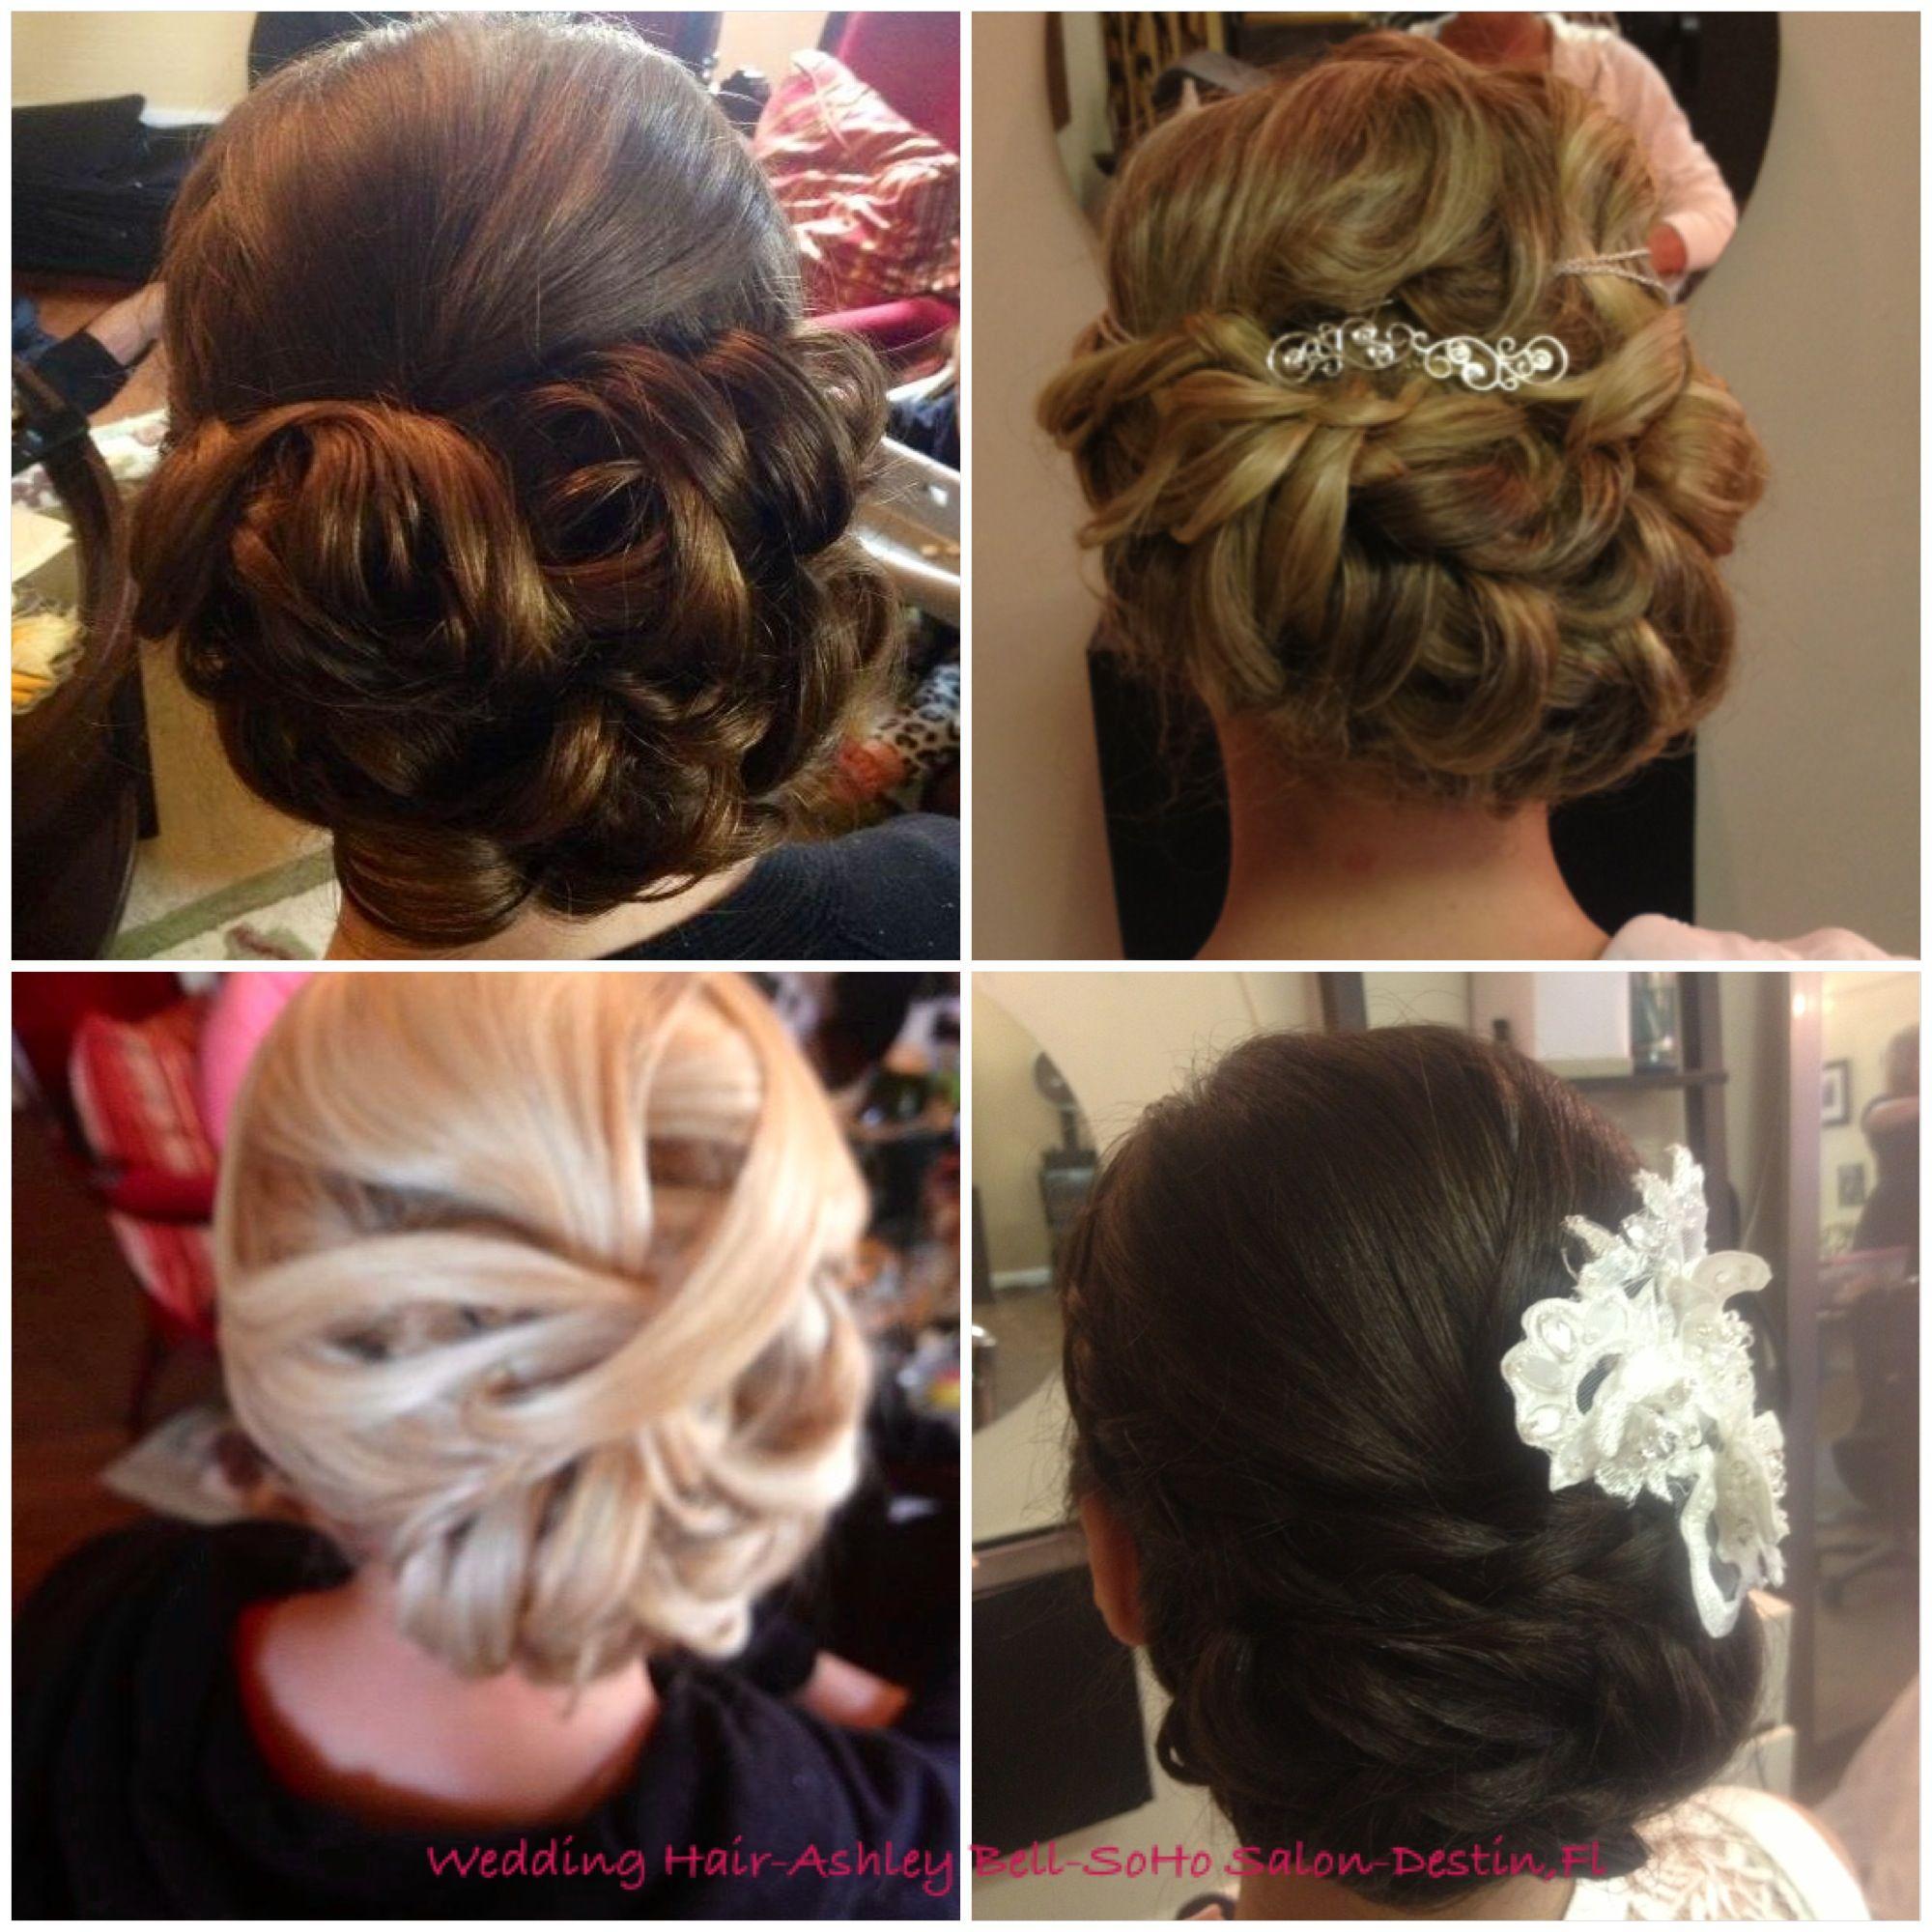 wedding hair by ashley bell, soho salon, destin, fl | hair and make